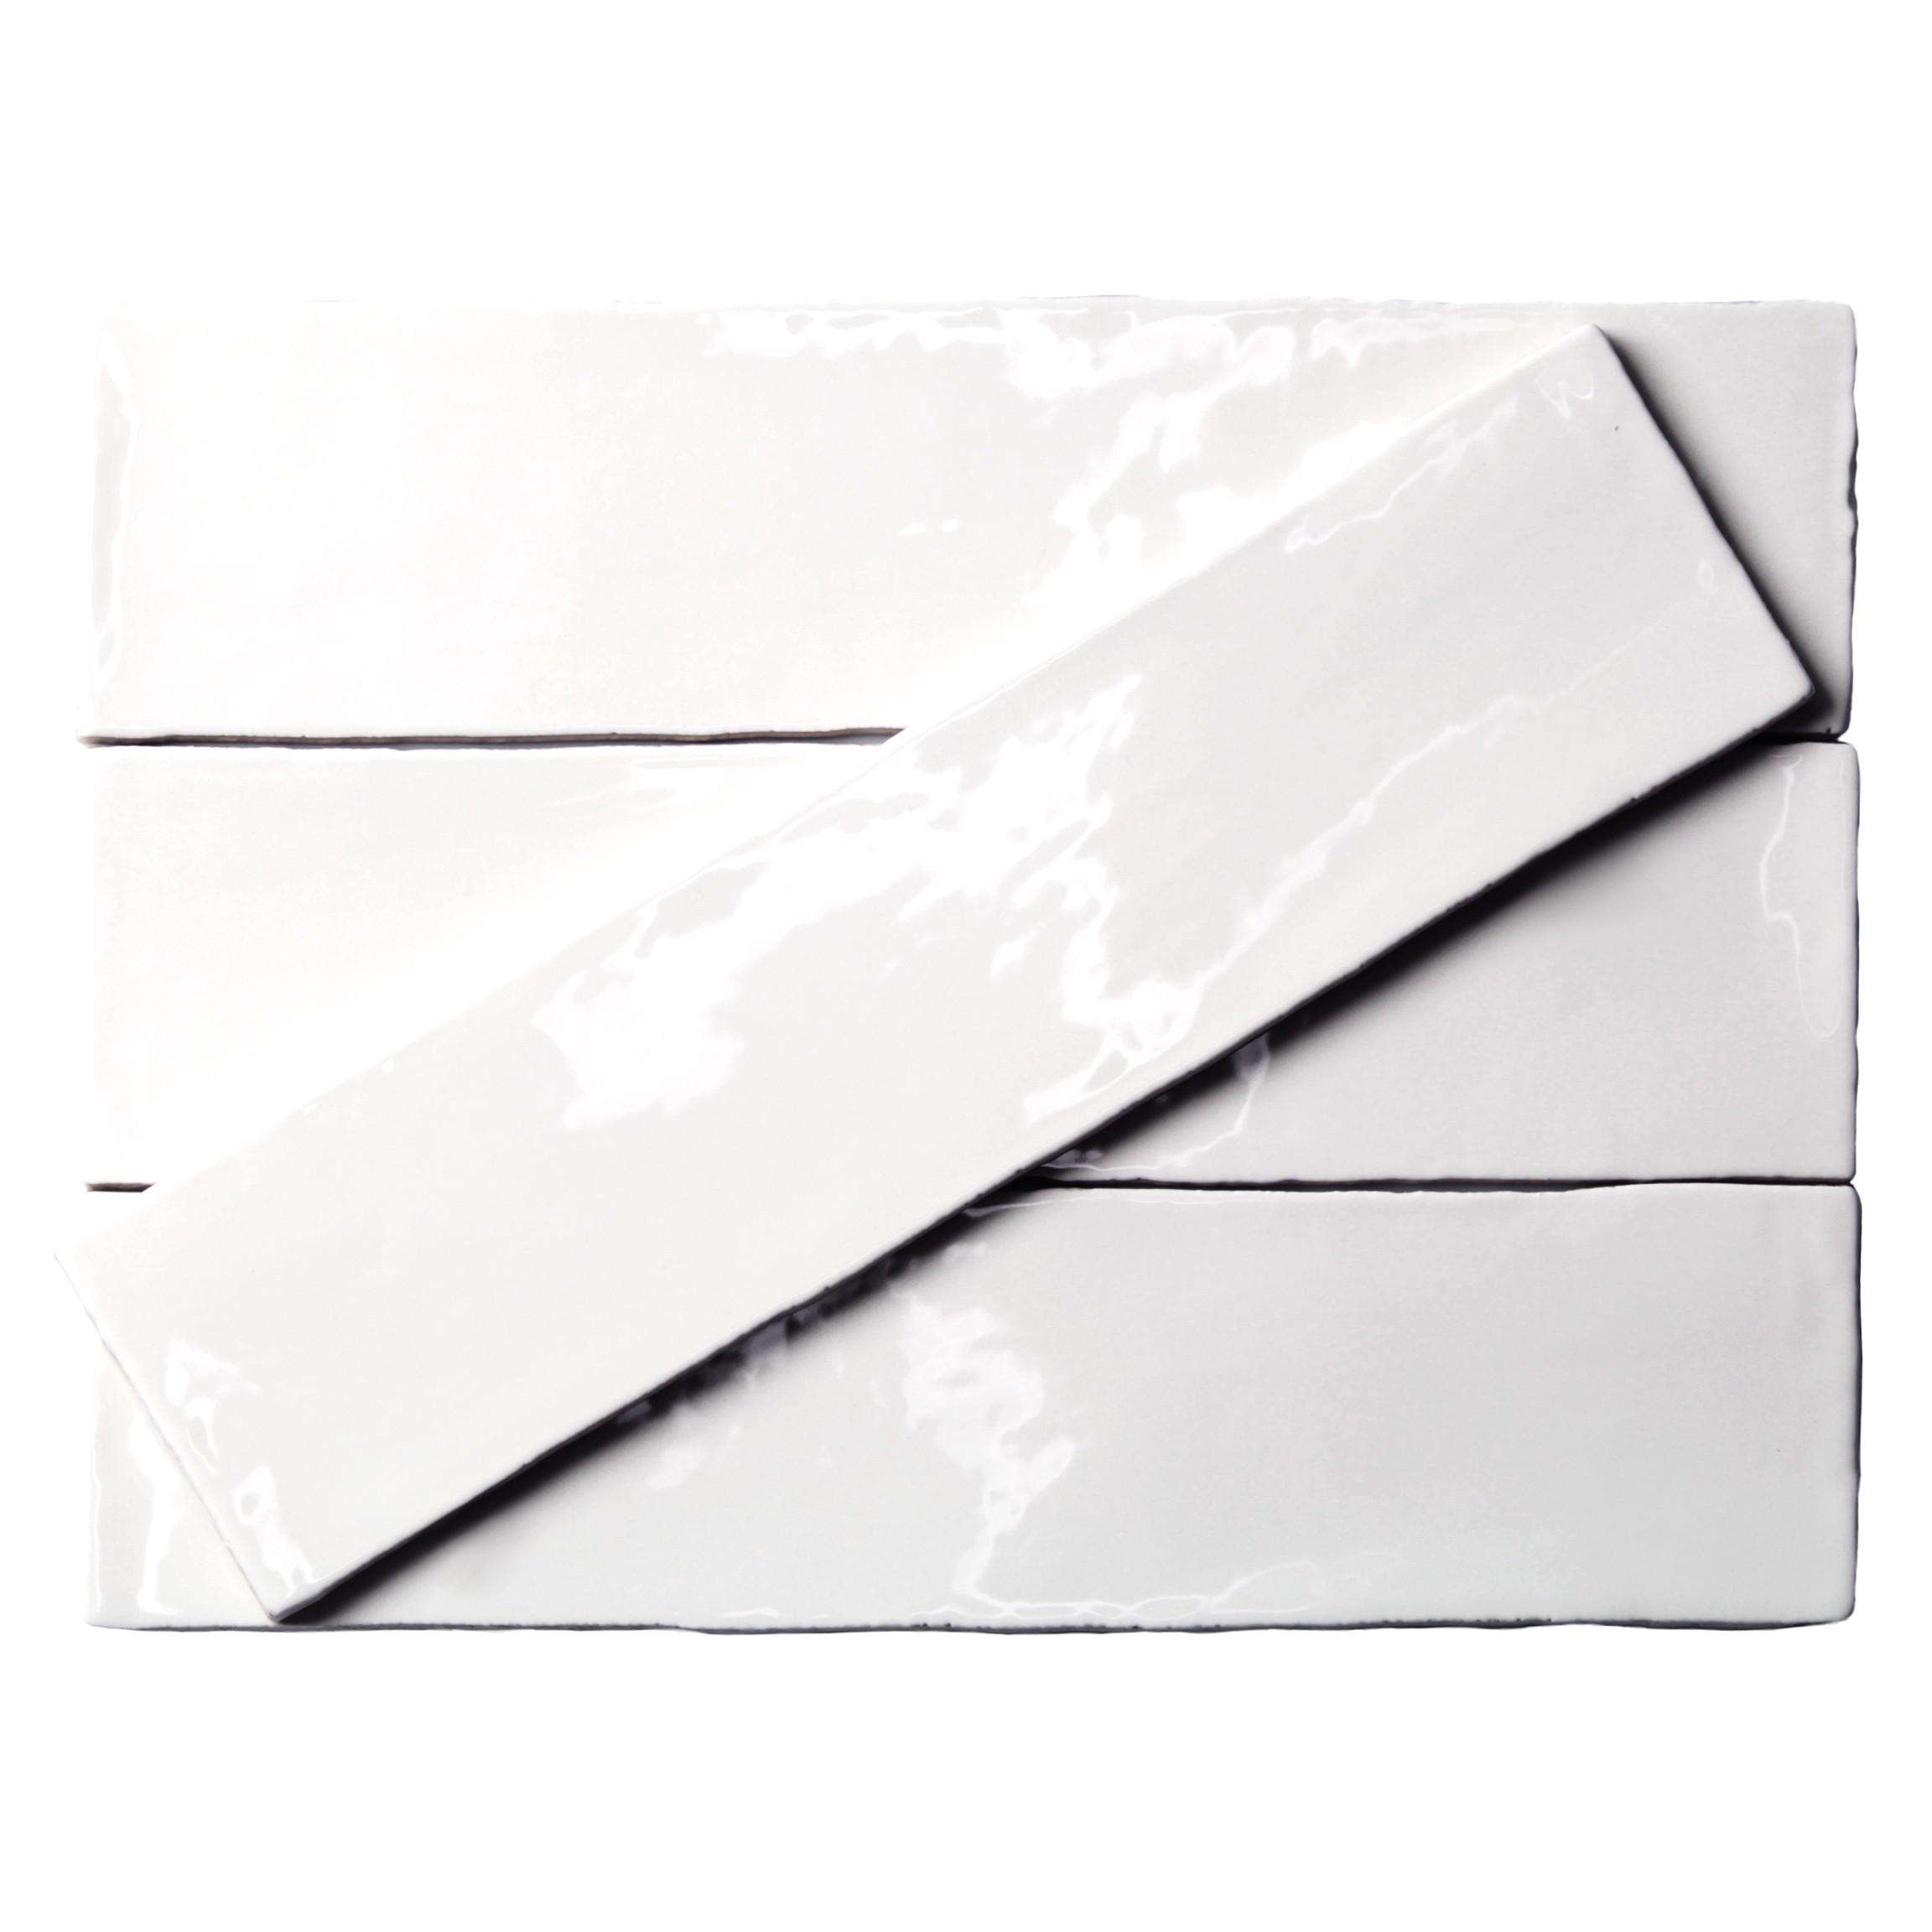 Porcelain Vs Ceramic Tile A Detailed Comparison: Shop For Lancaster 3x12 Bianco Ceramic Tile At TileBar.com